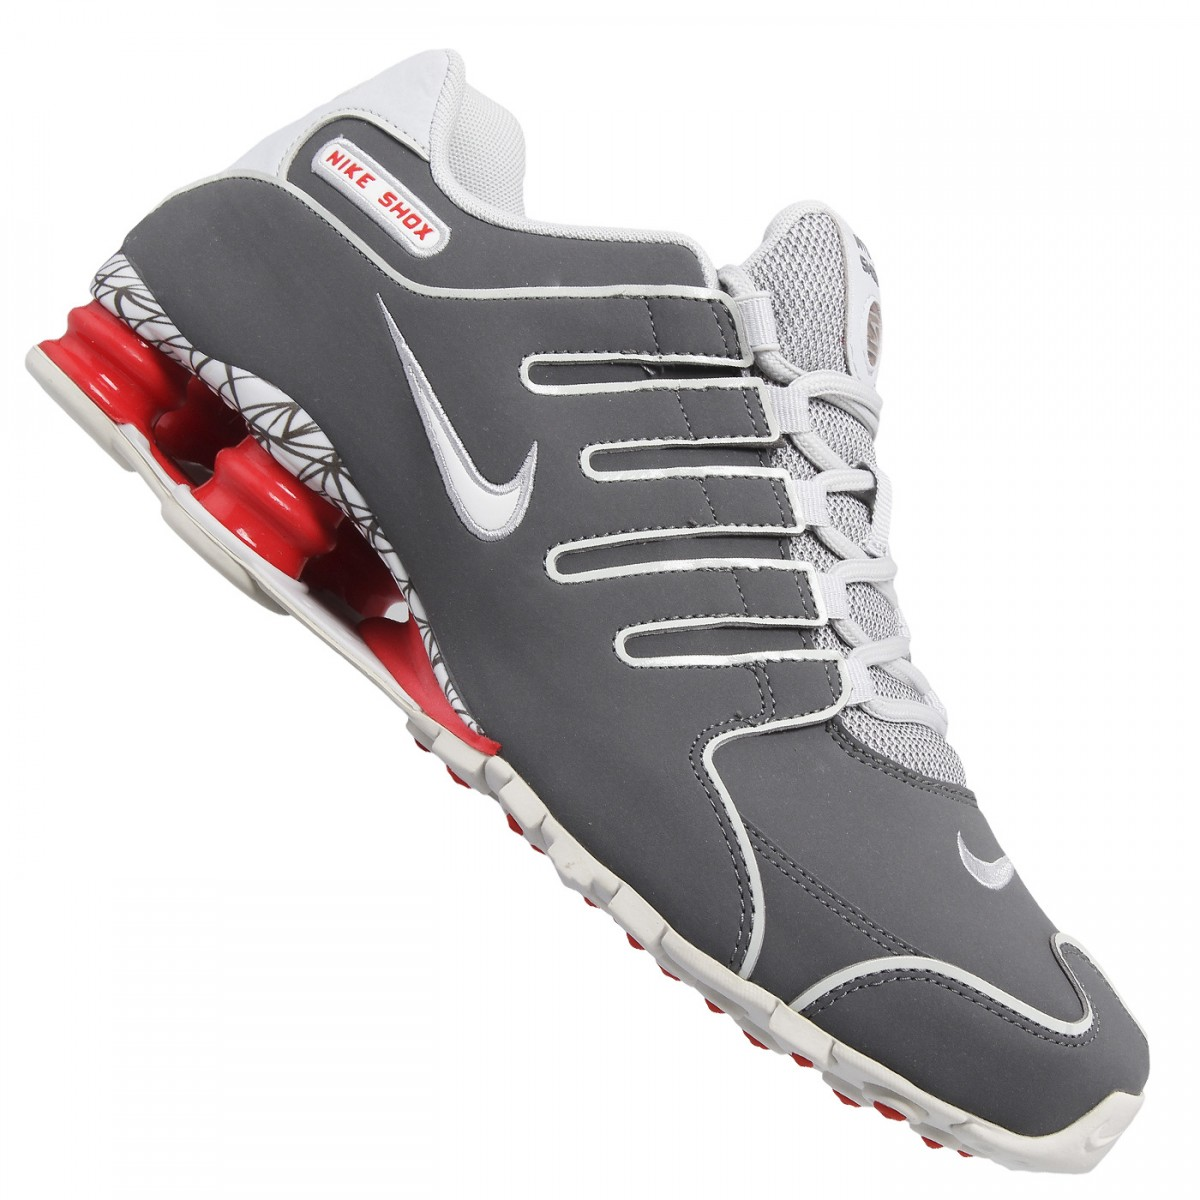 0db46dbbe7e Tênis Nike Shox NZ EU